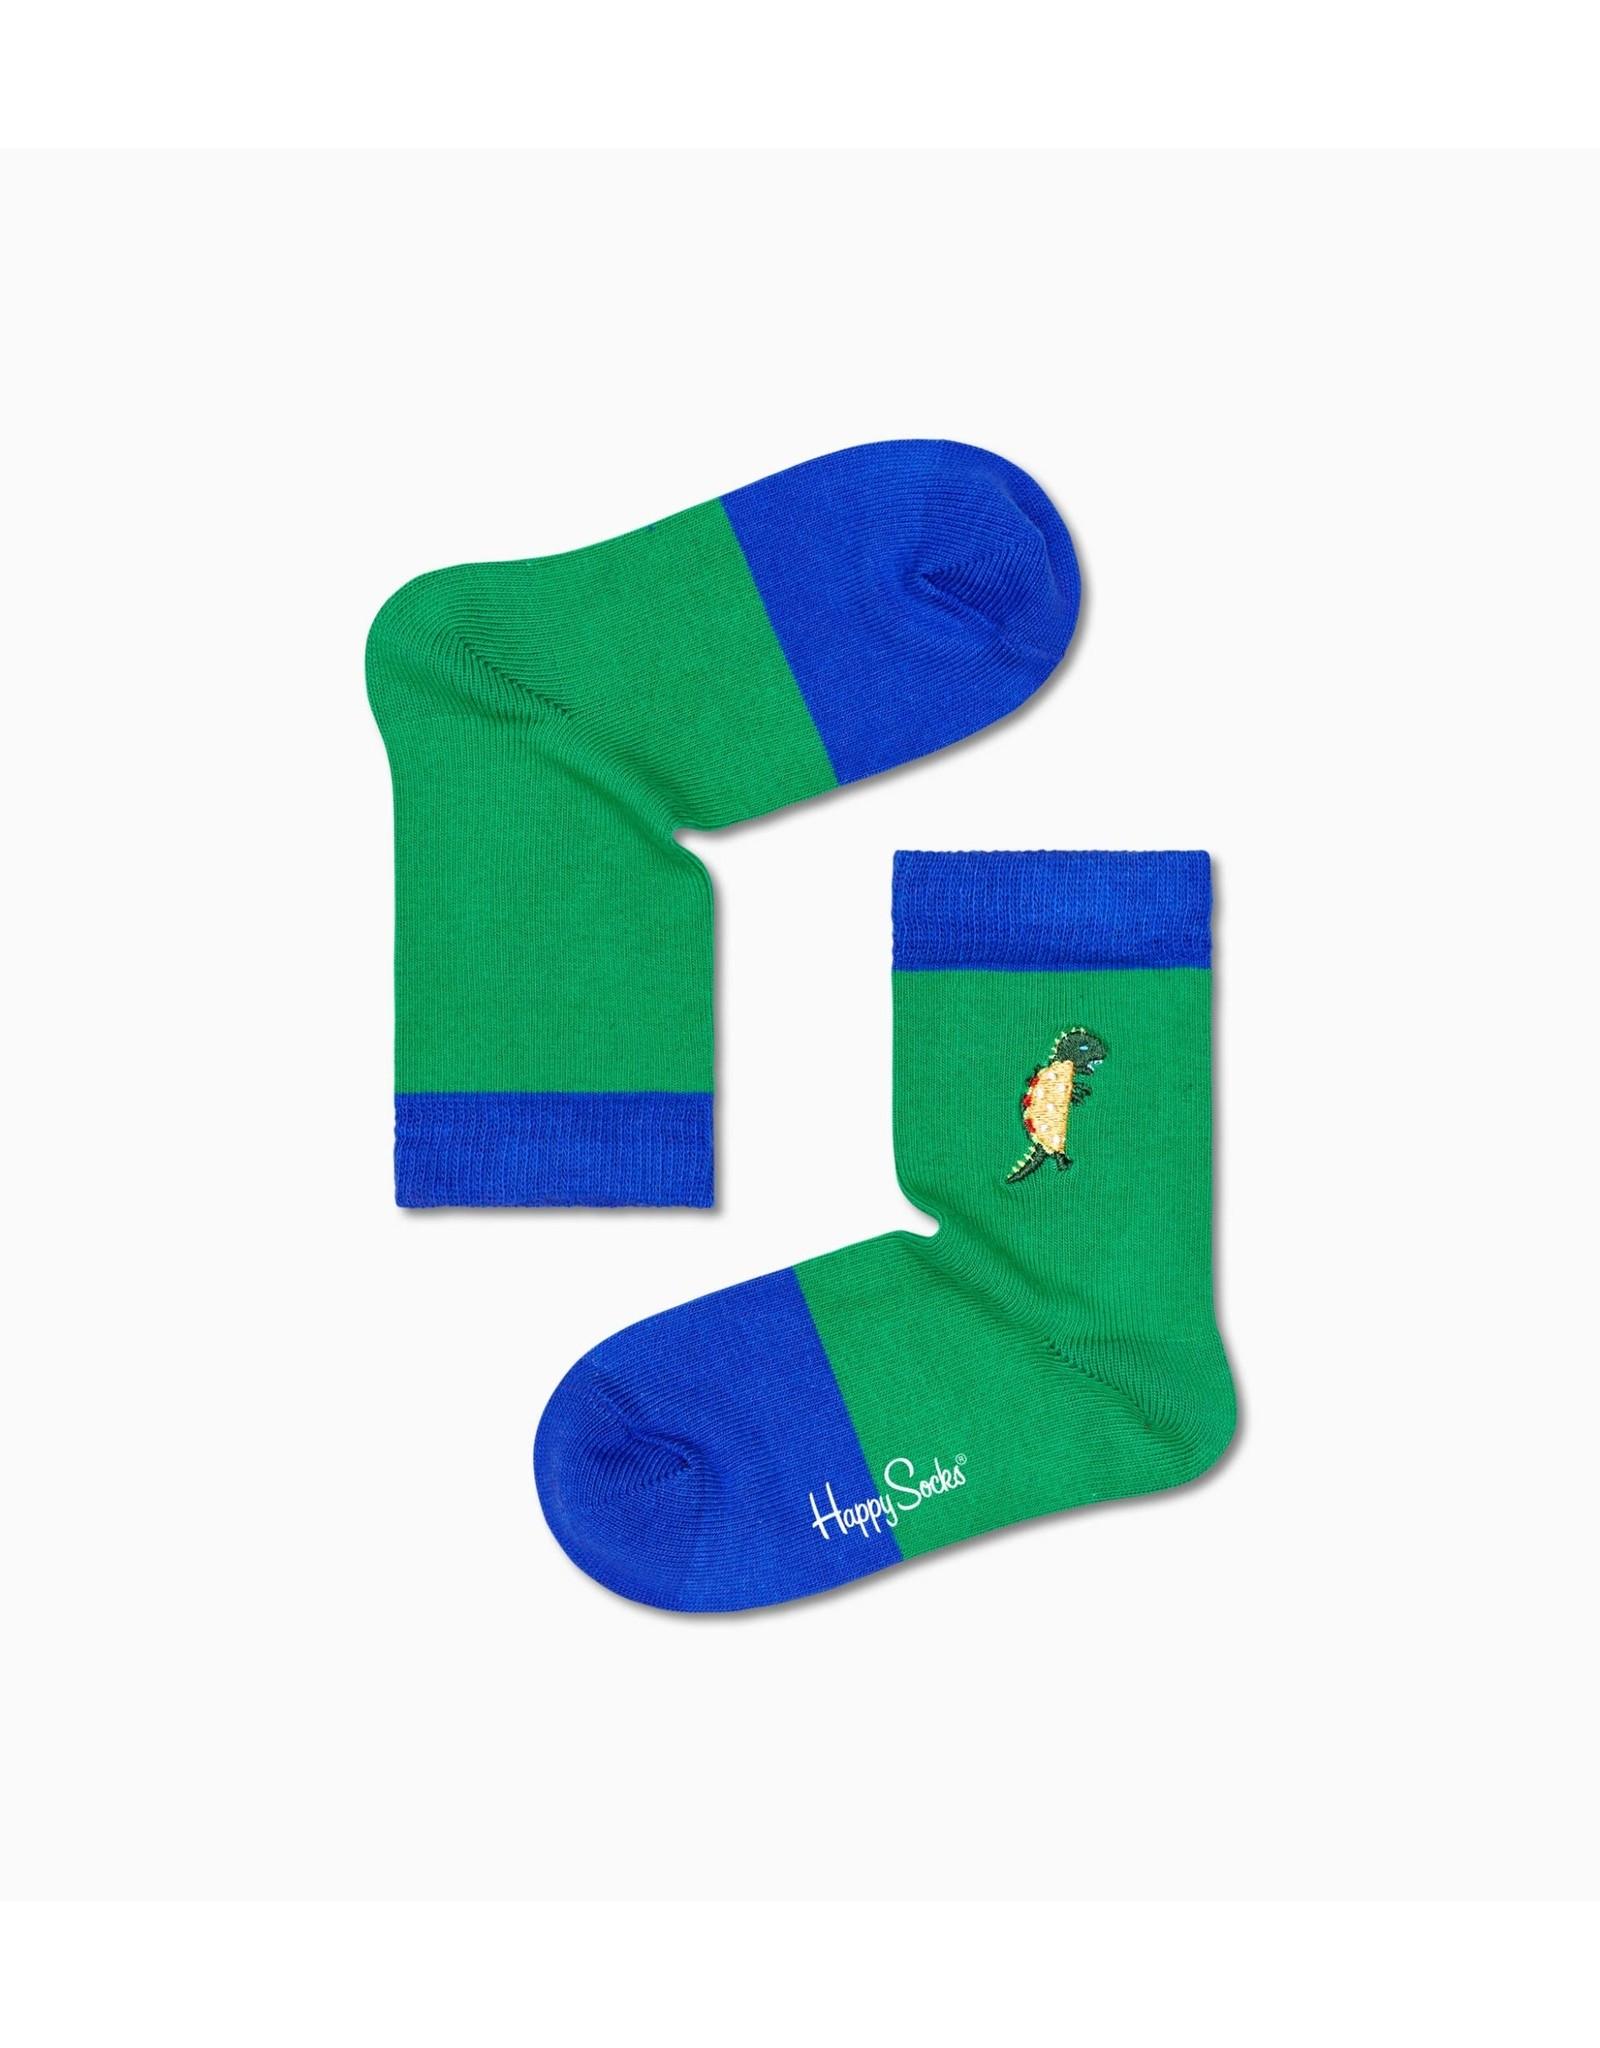 Happy Socks Blauw groene sokken met taco dinosaurus